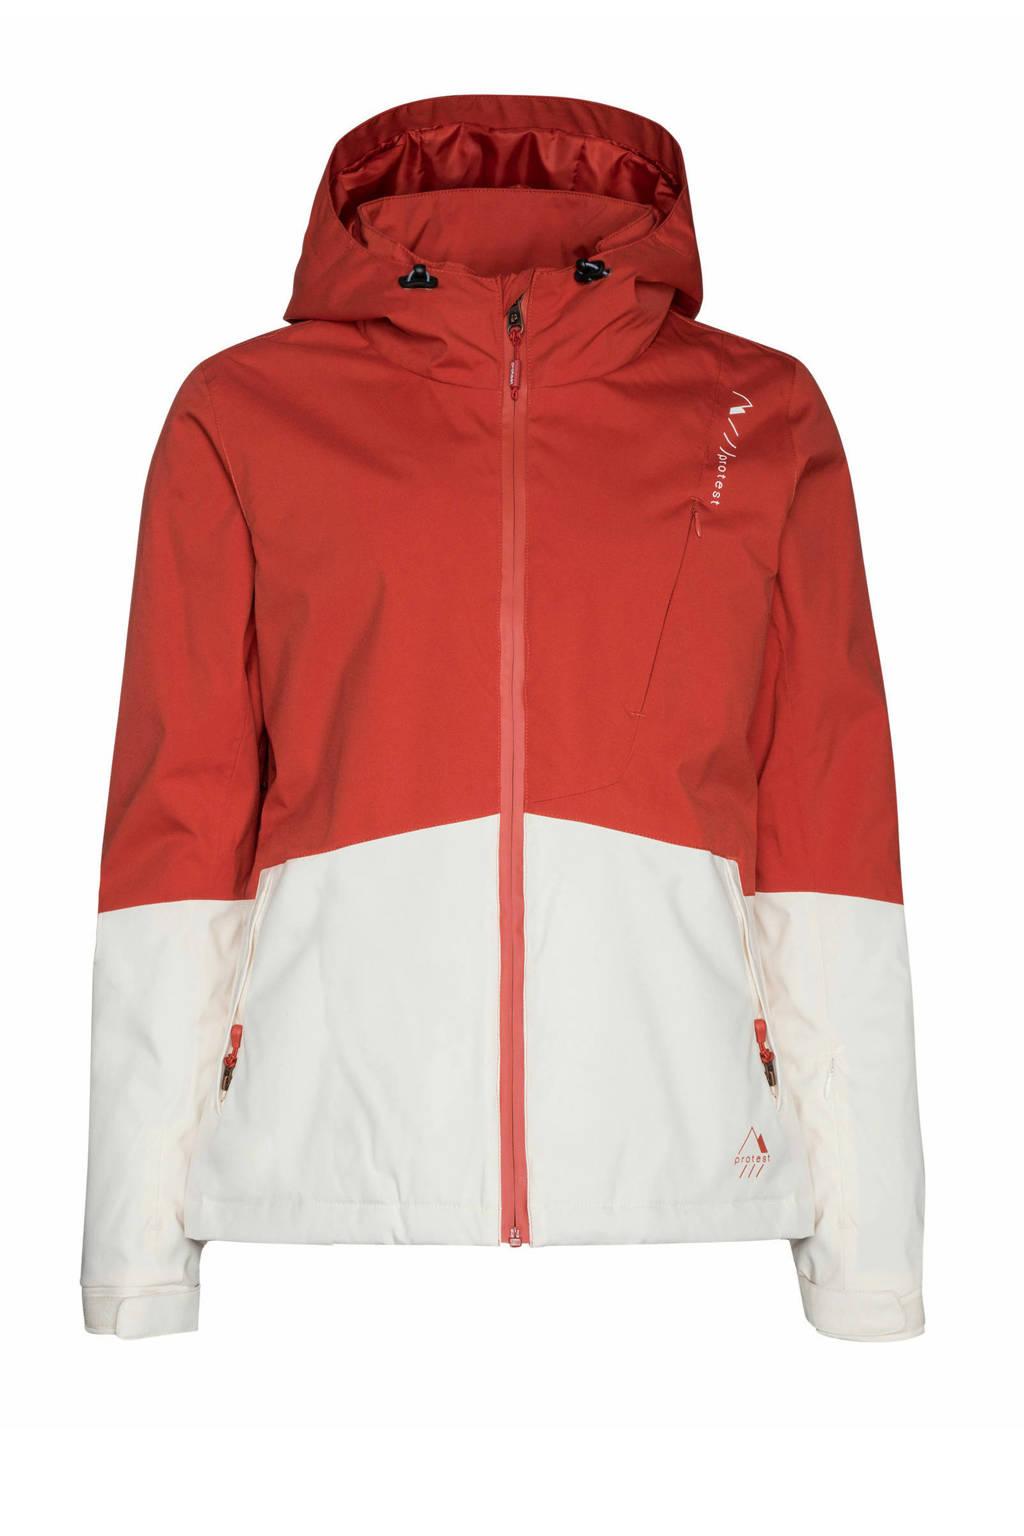 Protest ski-jack Chica rood/wit, Rocky